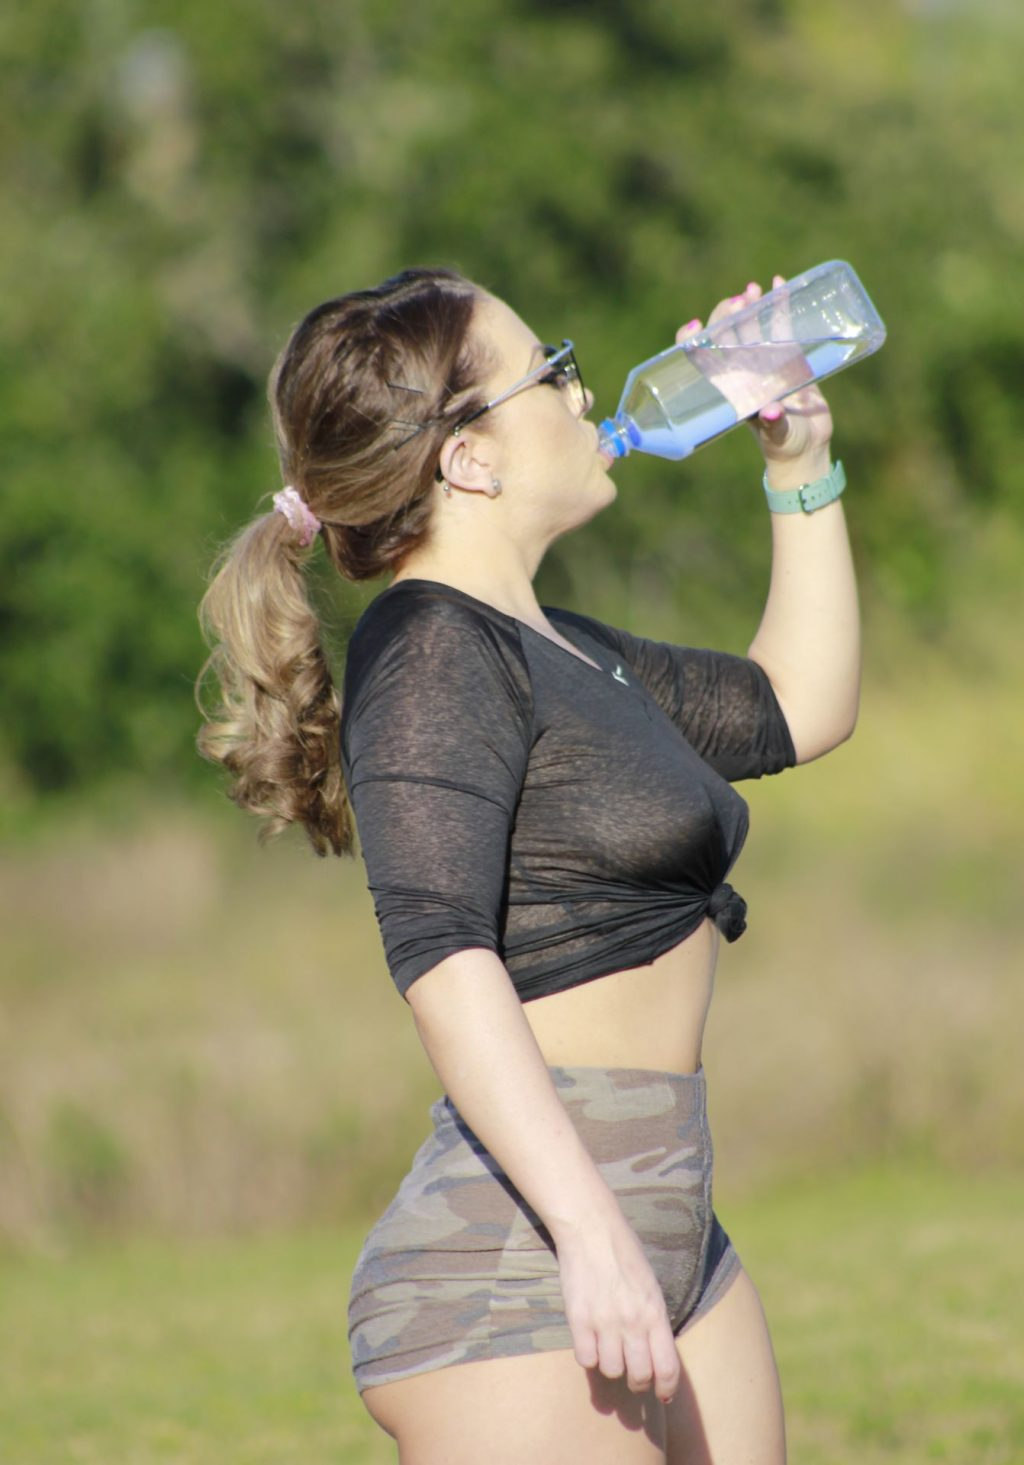 Carmen Valentina, Stefania Mafra Sexy (18 Photos)